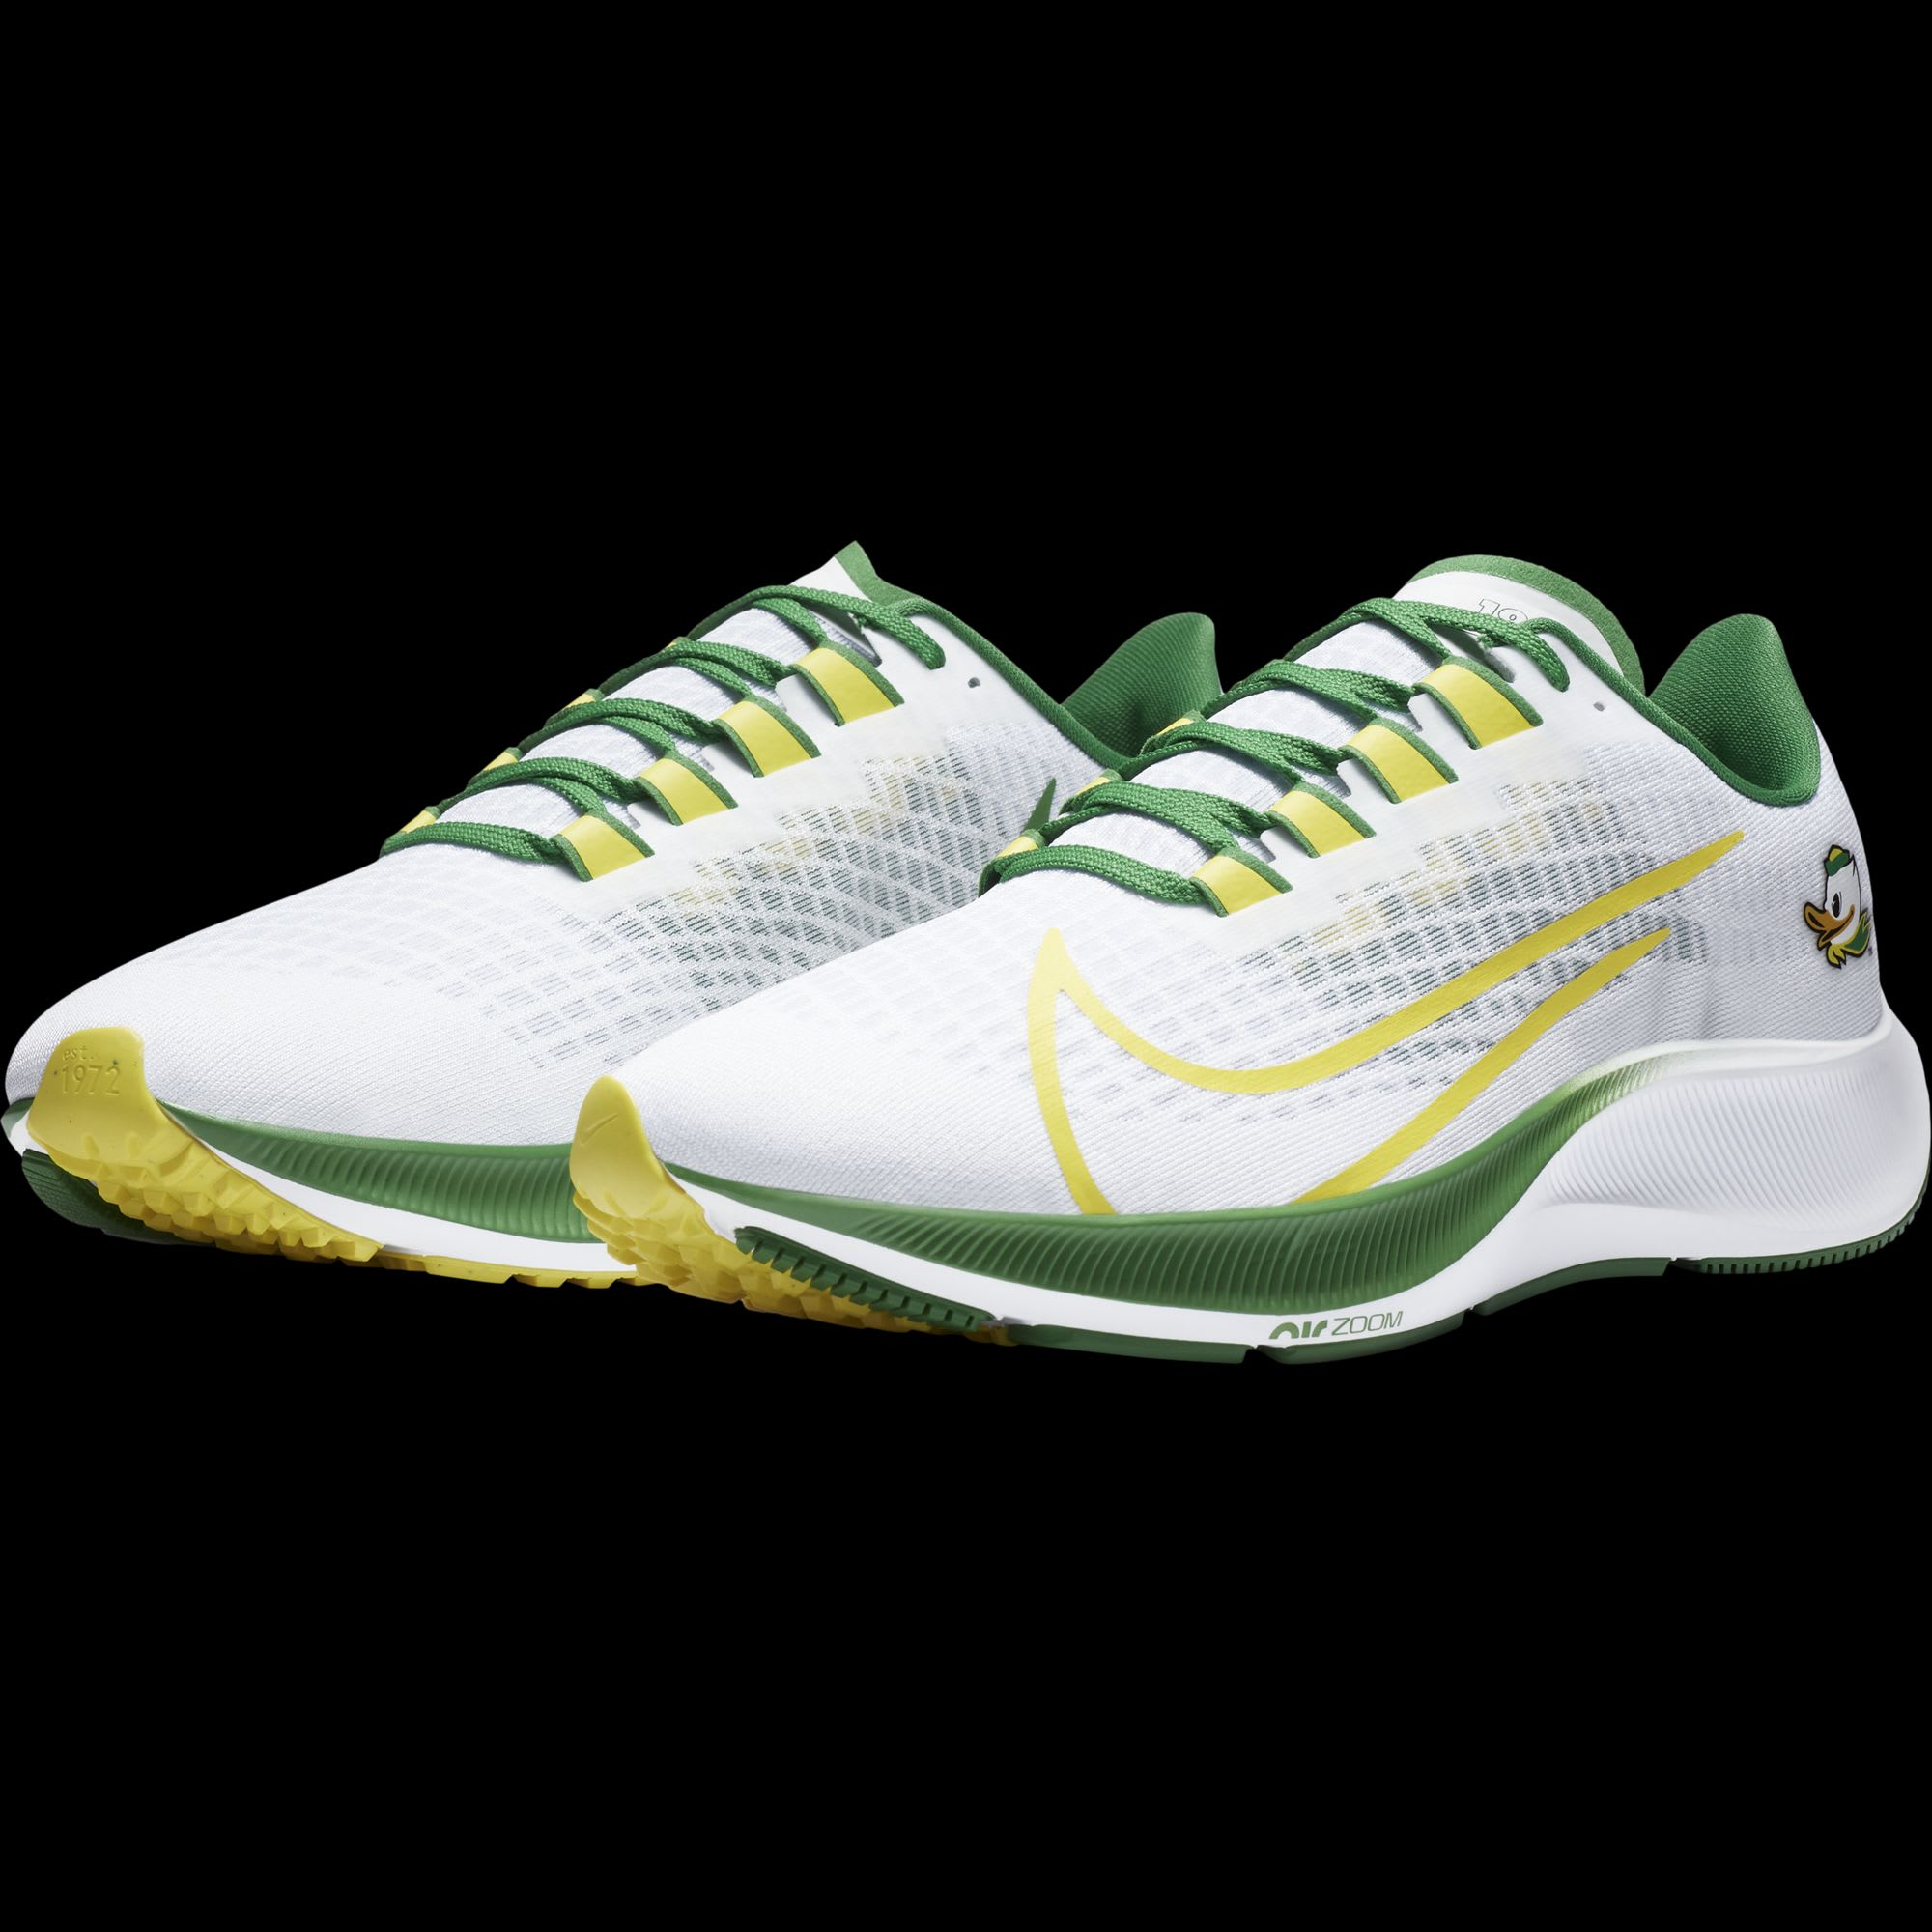 The Nike Air Zoom Pegasus 37 Oregon